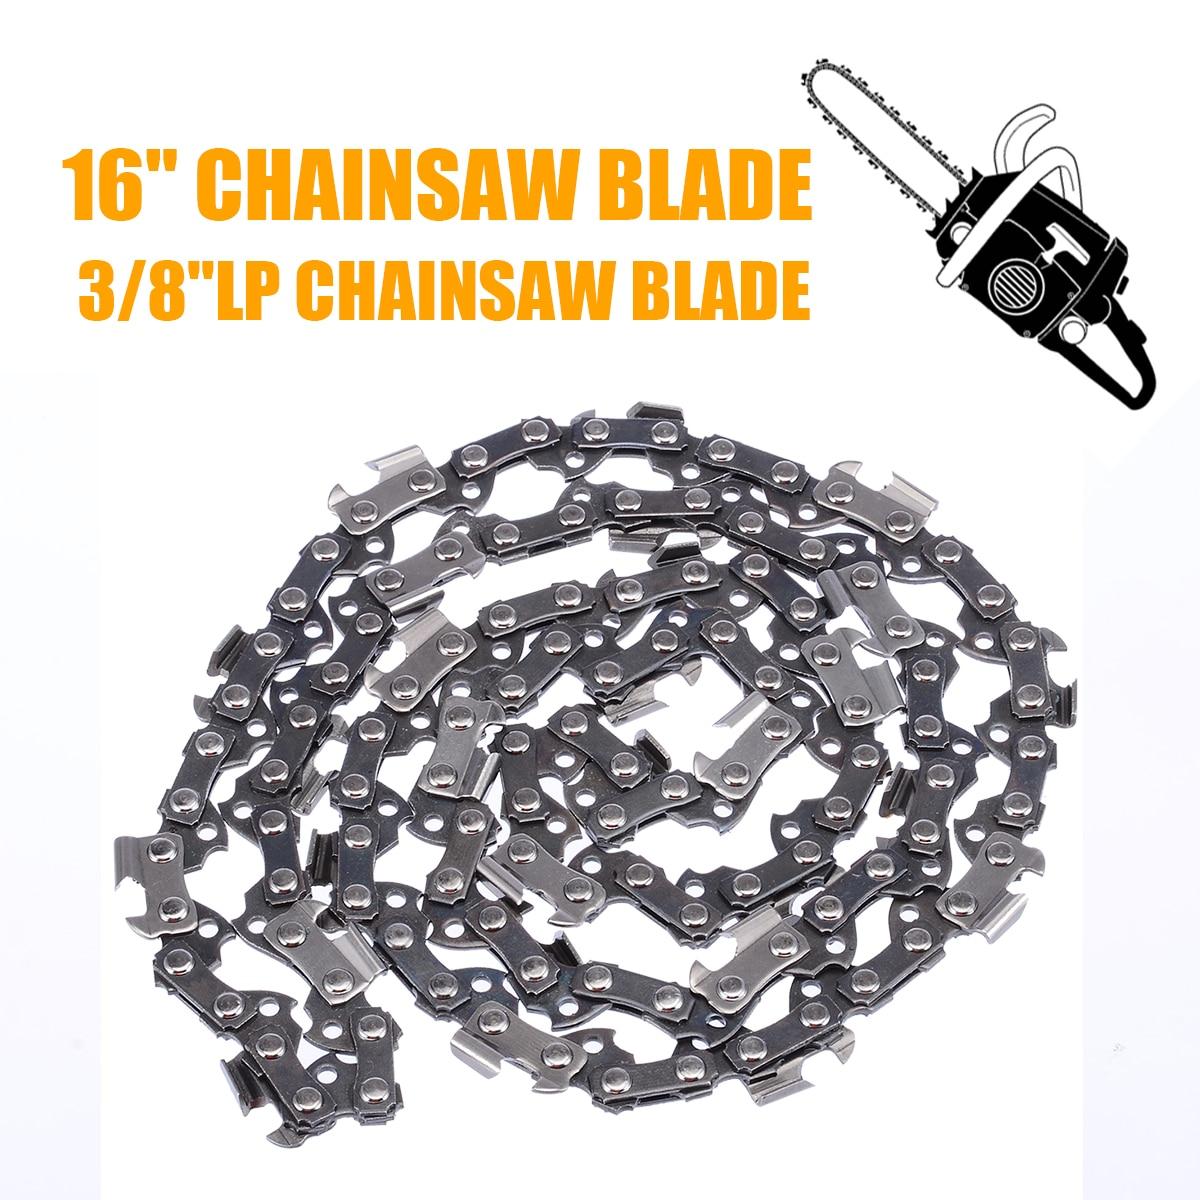 Mayitr Wood Cutting Chainsaw Parts 16 Chainsaw Saw Chain Blade Pitch 3/8LP 0.050 56DL Blade Saw ChainsMayitr Wood Cutting Chainsaw Parts 16 Chainsaw Saw Chain Blade Pitch 3/8LP 0.050 56DL Blade Saw Chains